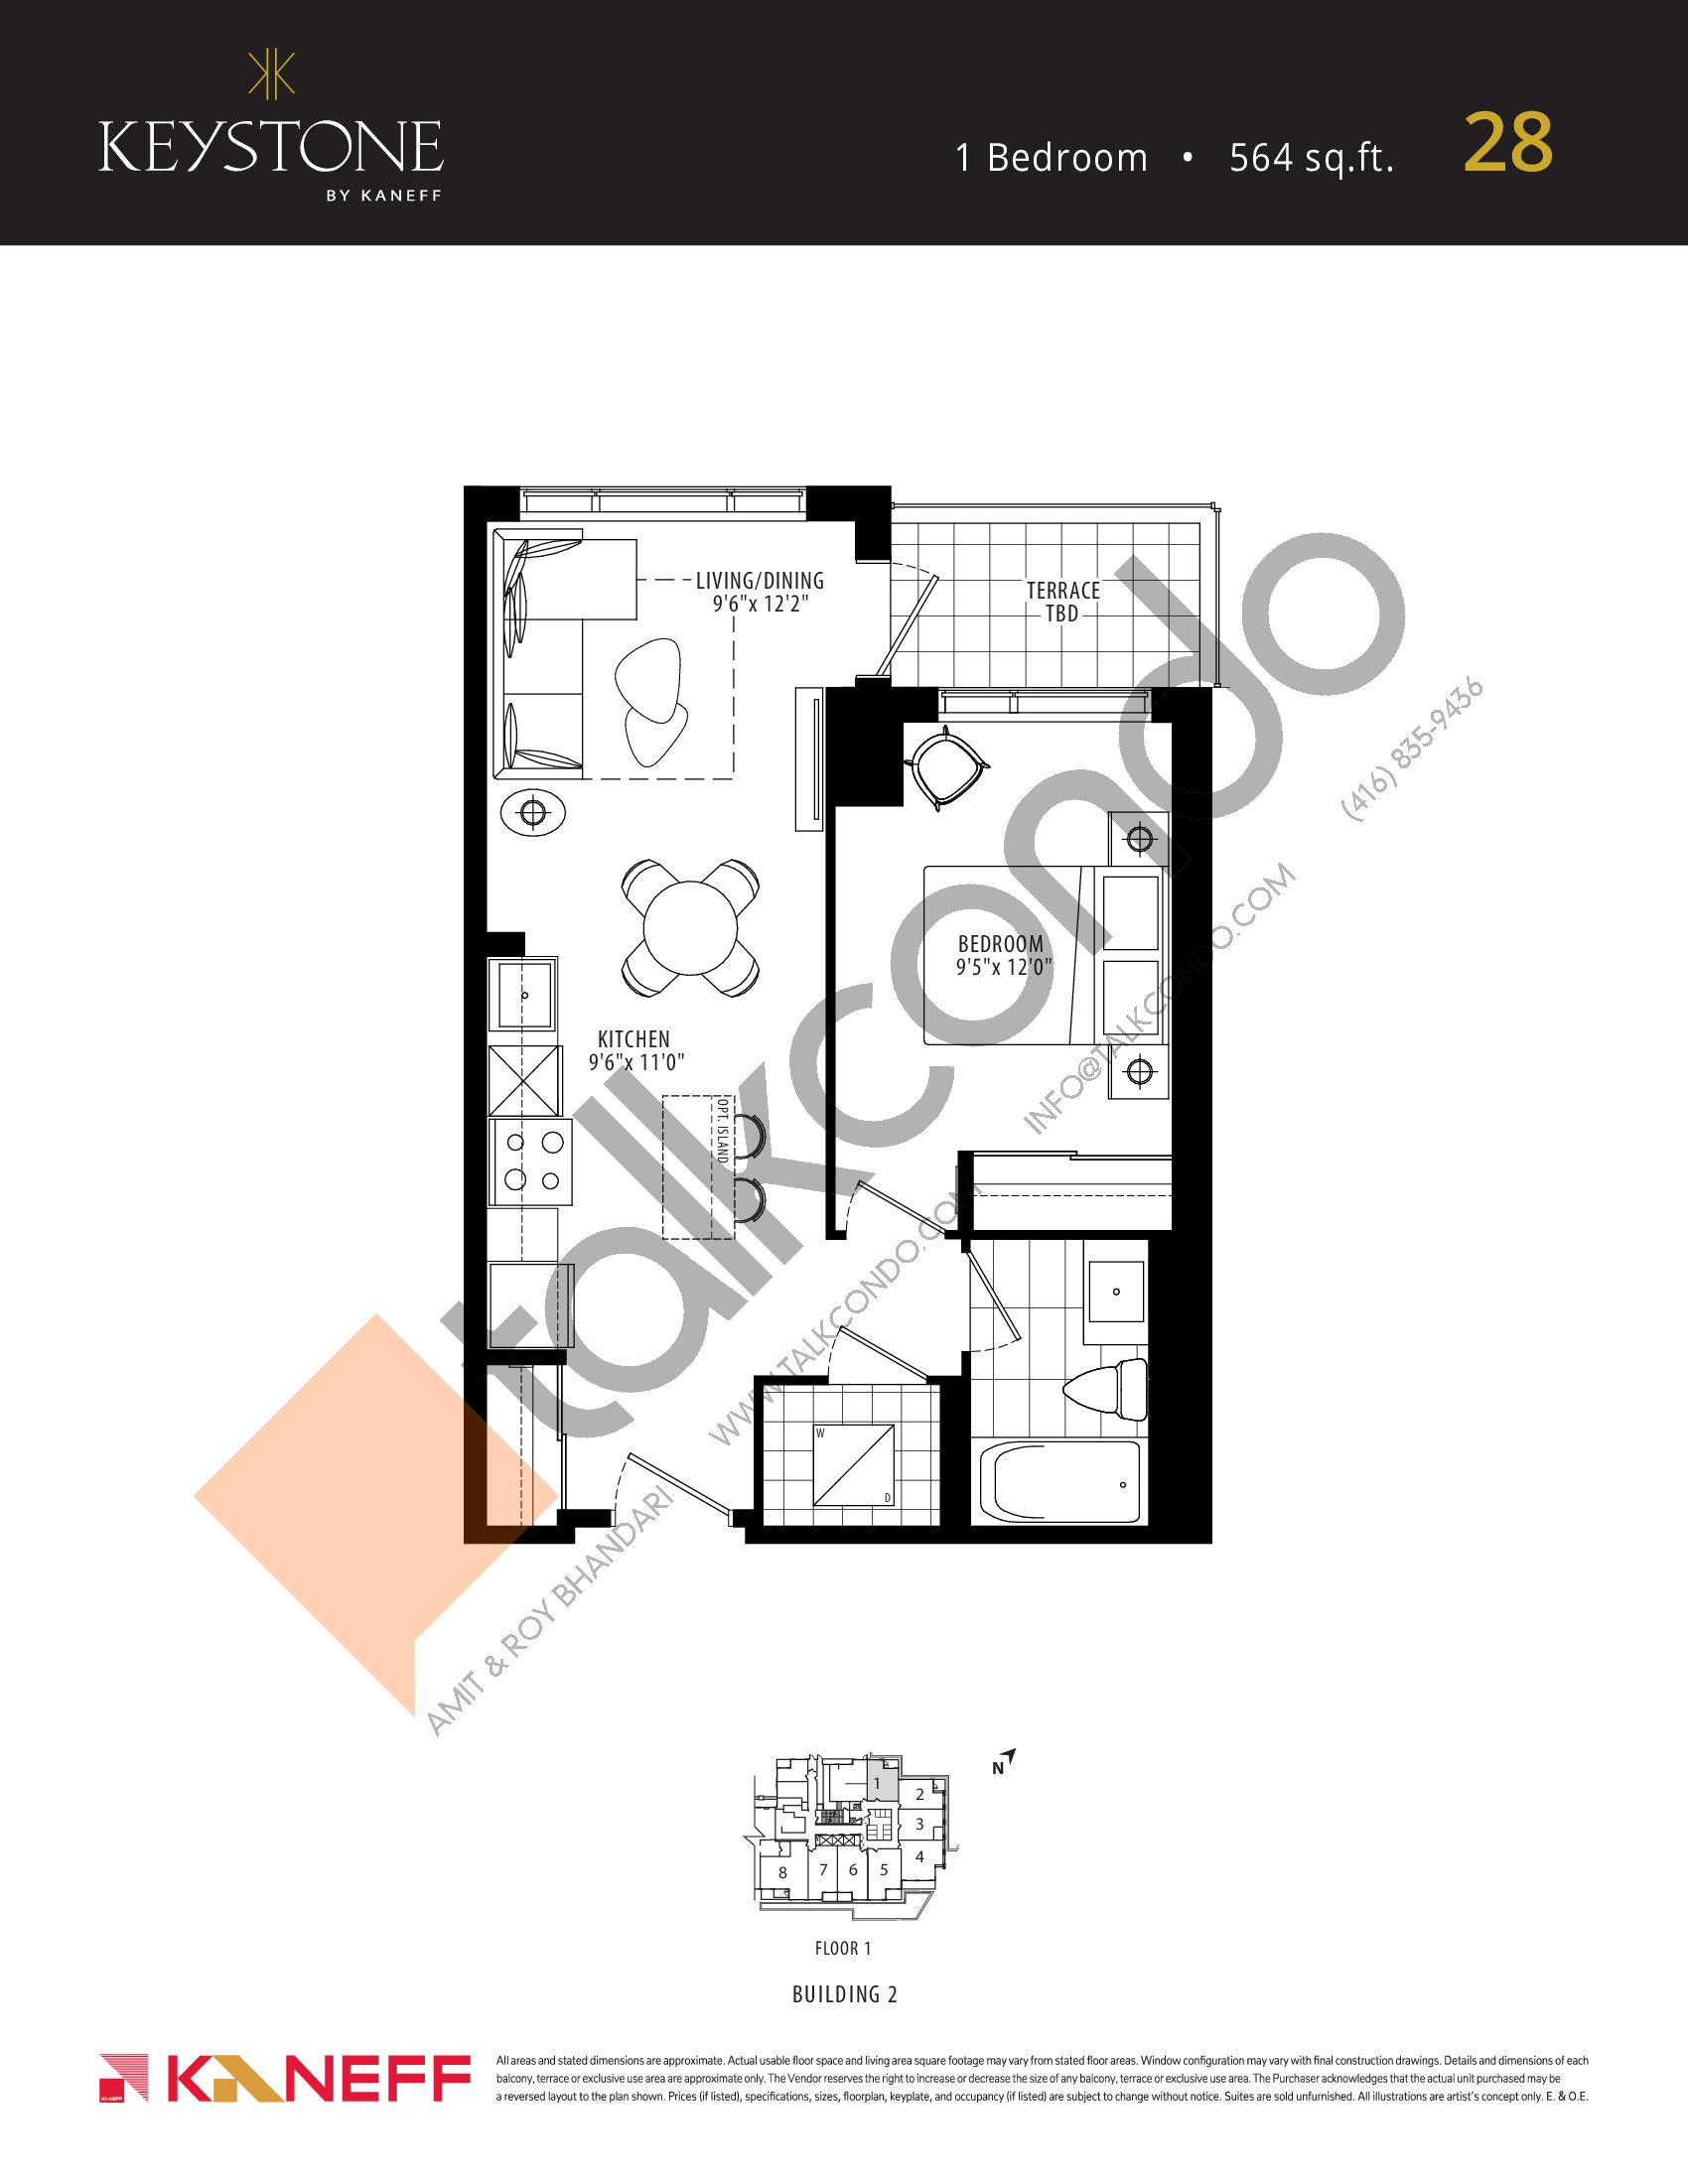 28 Floor Plan at Keystone Condos Phase 2 - 564 sq.ft